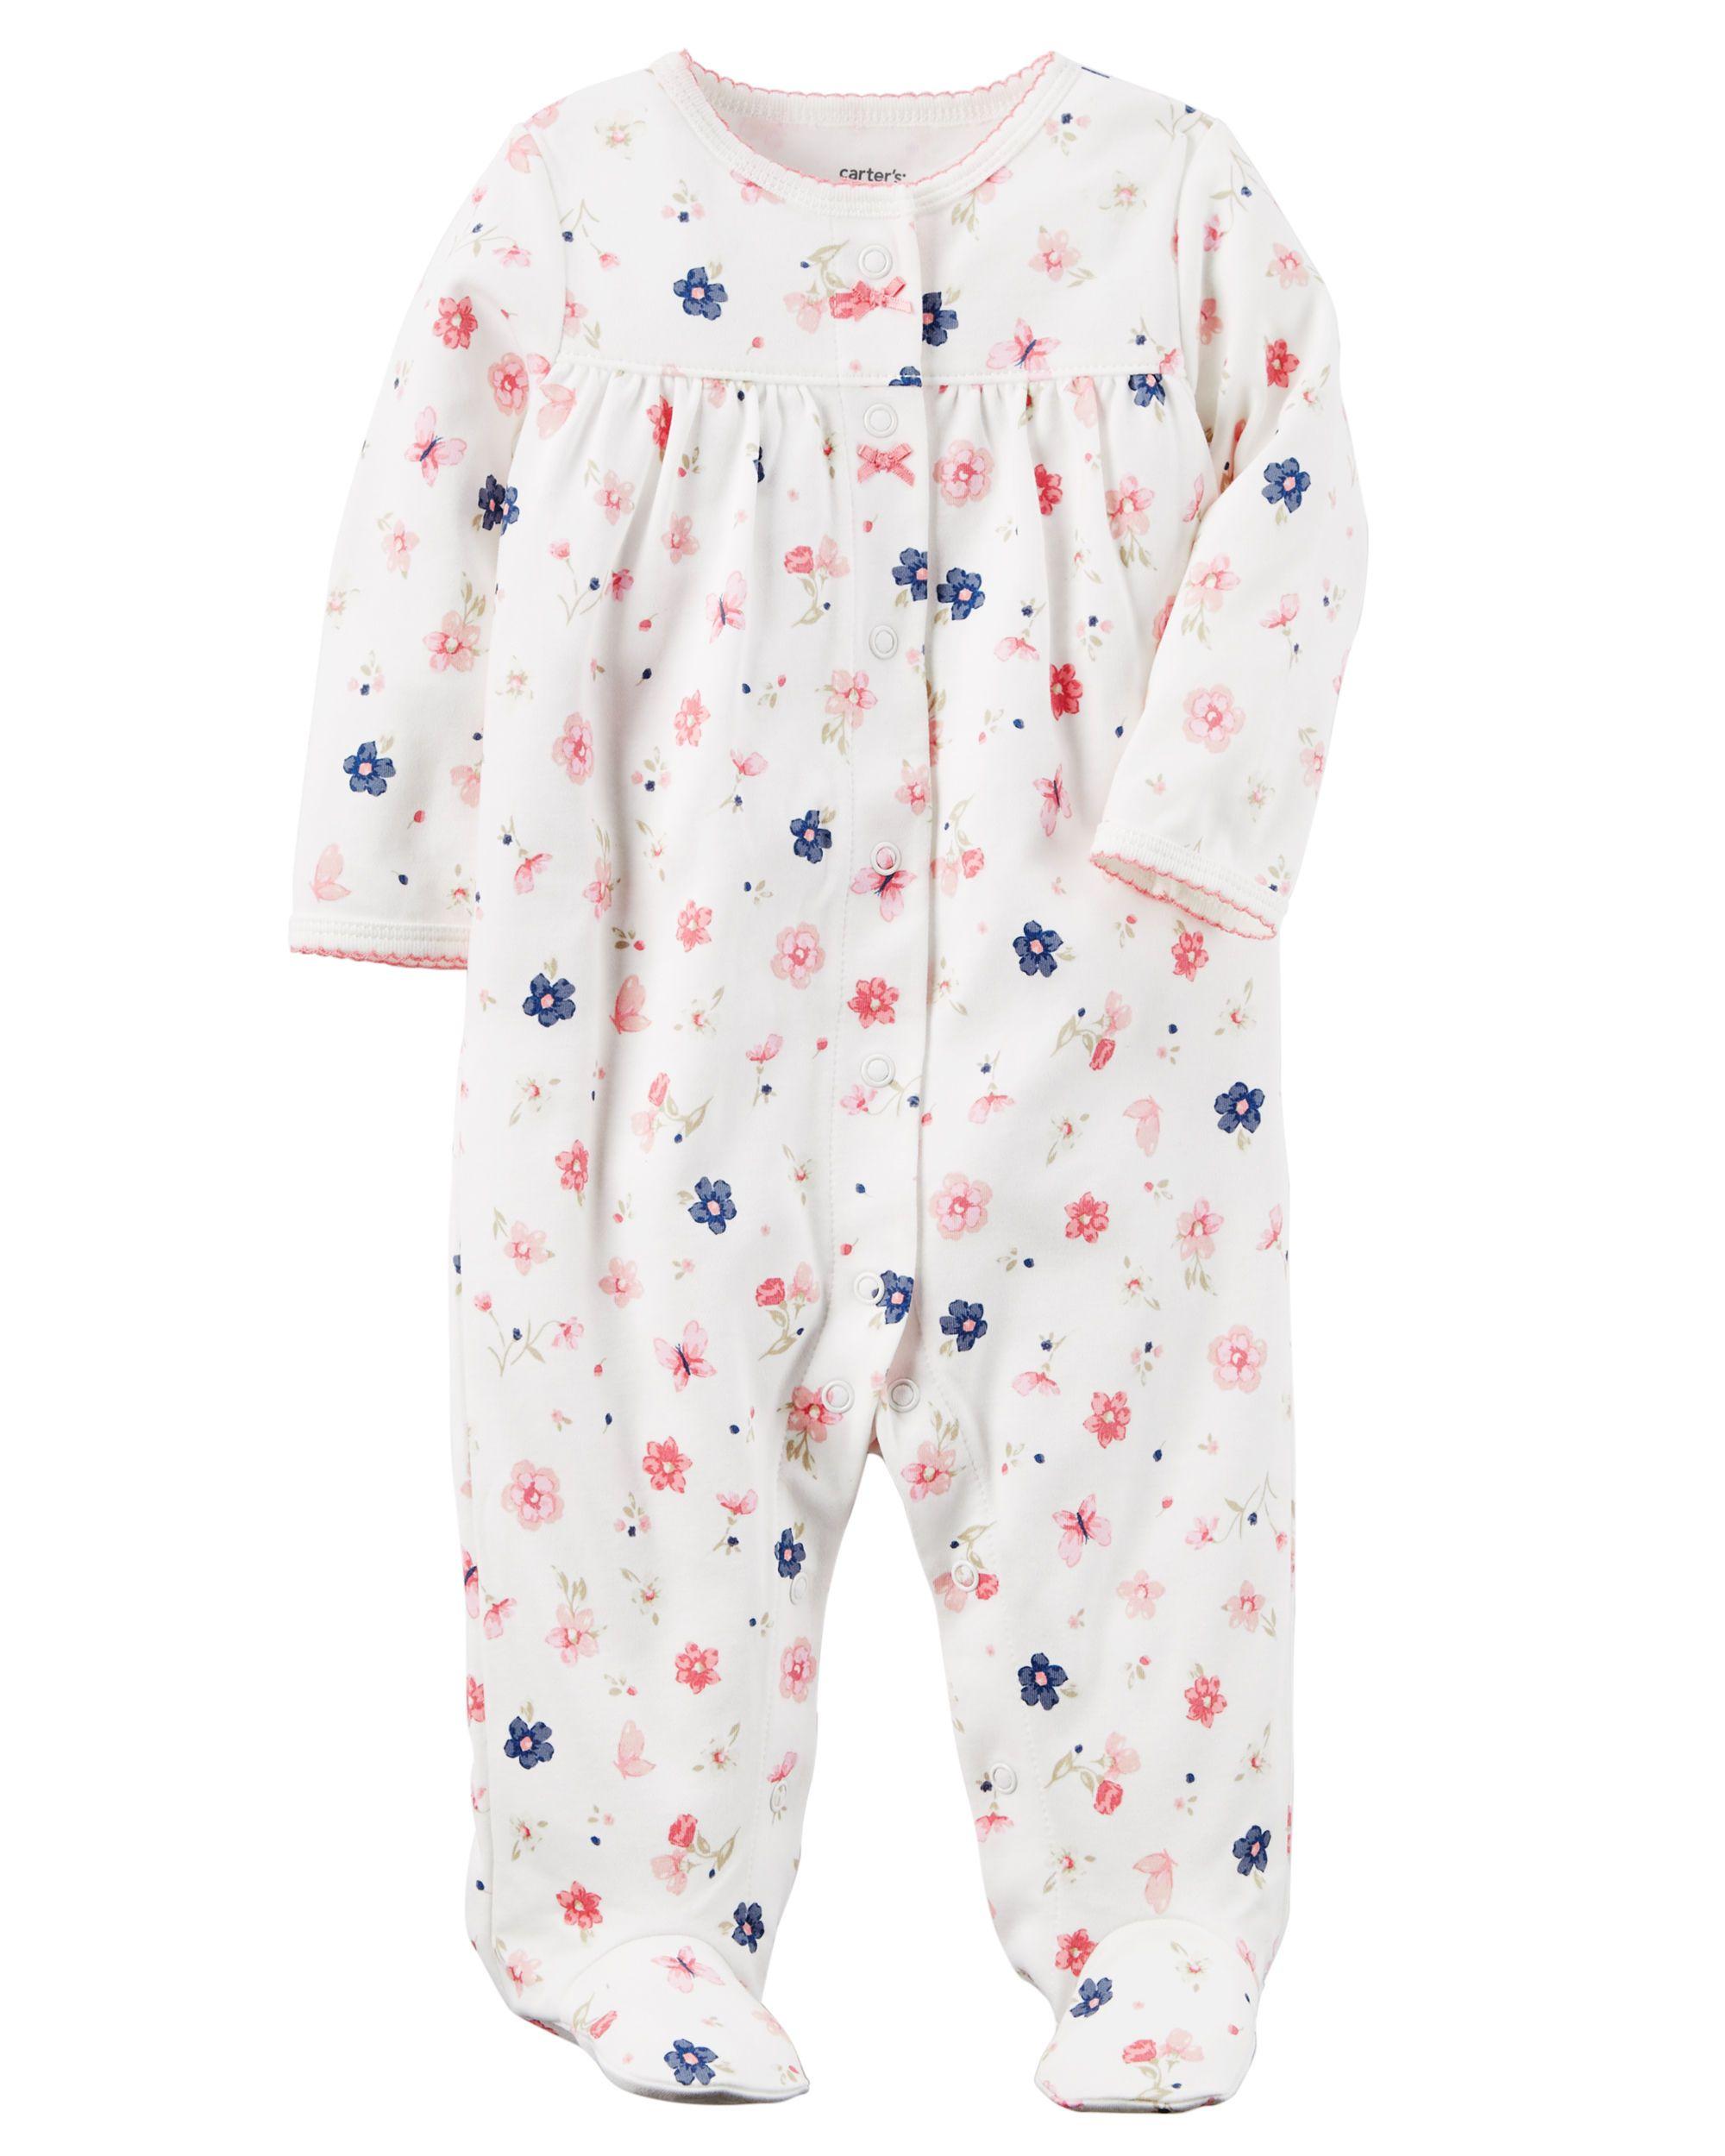 6ed7f1b026e8 Cotton Snap-Up Sleep   Play